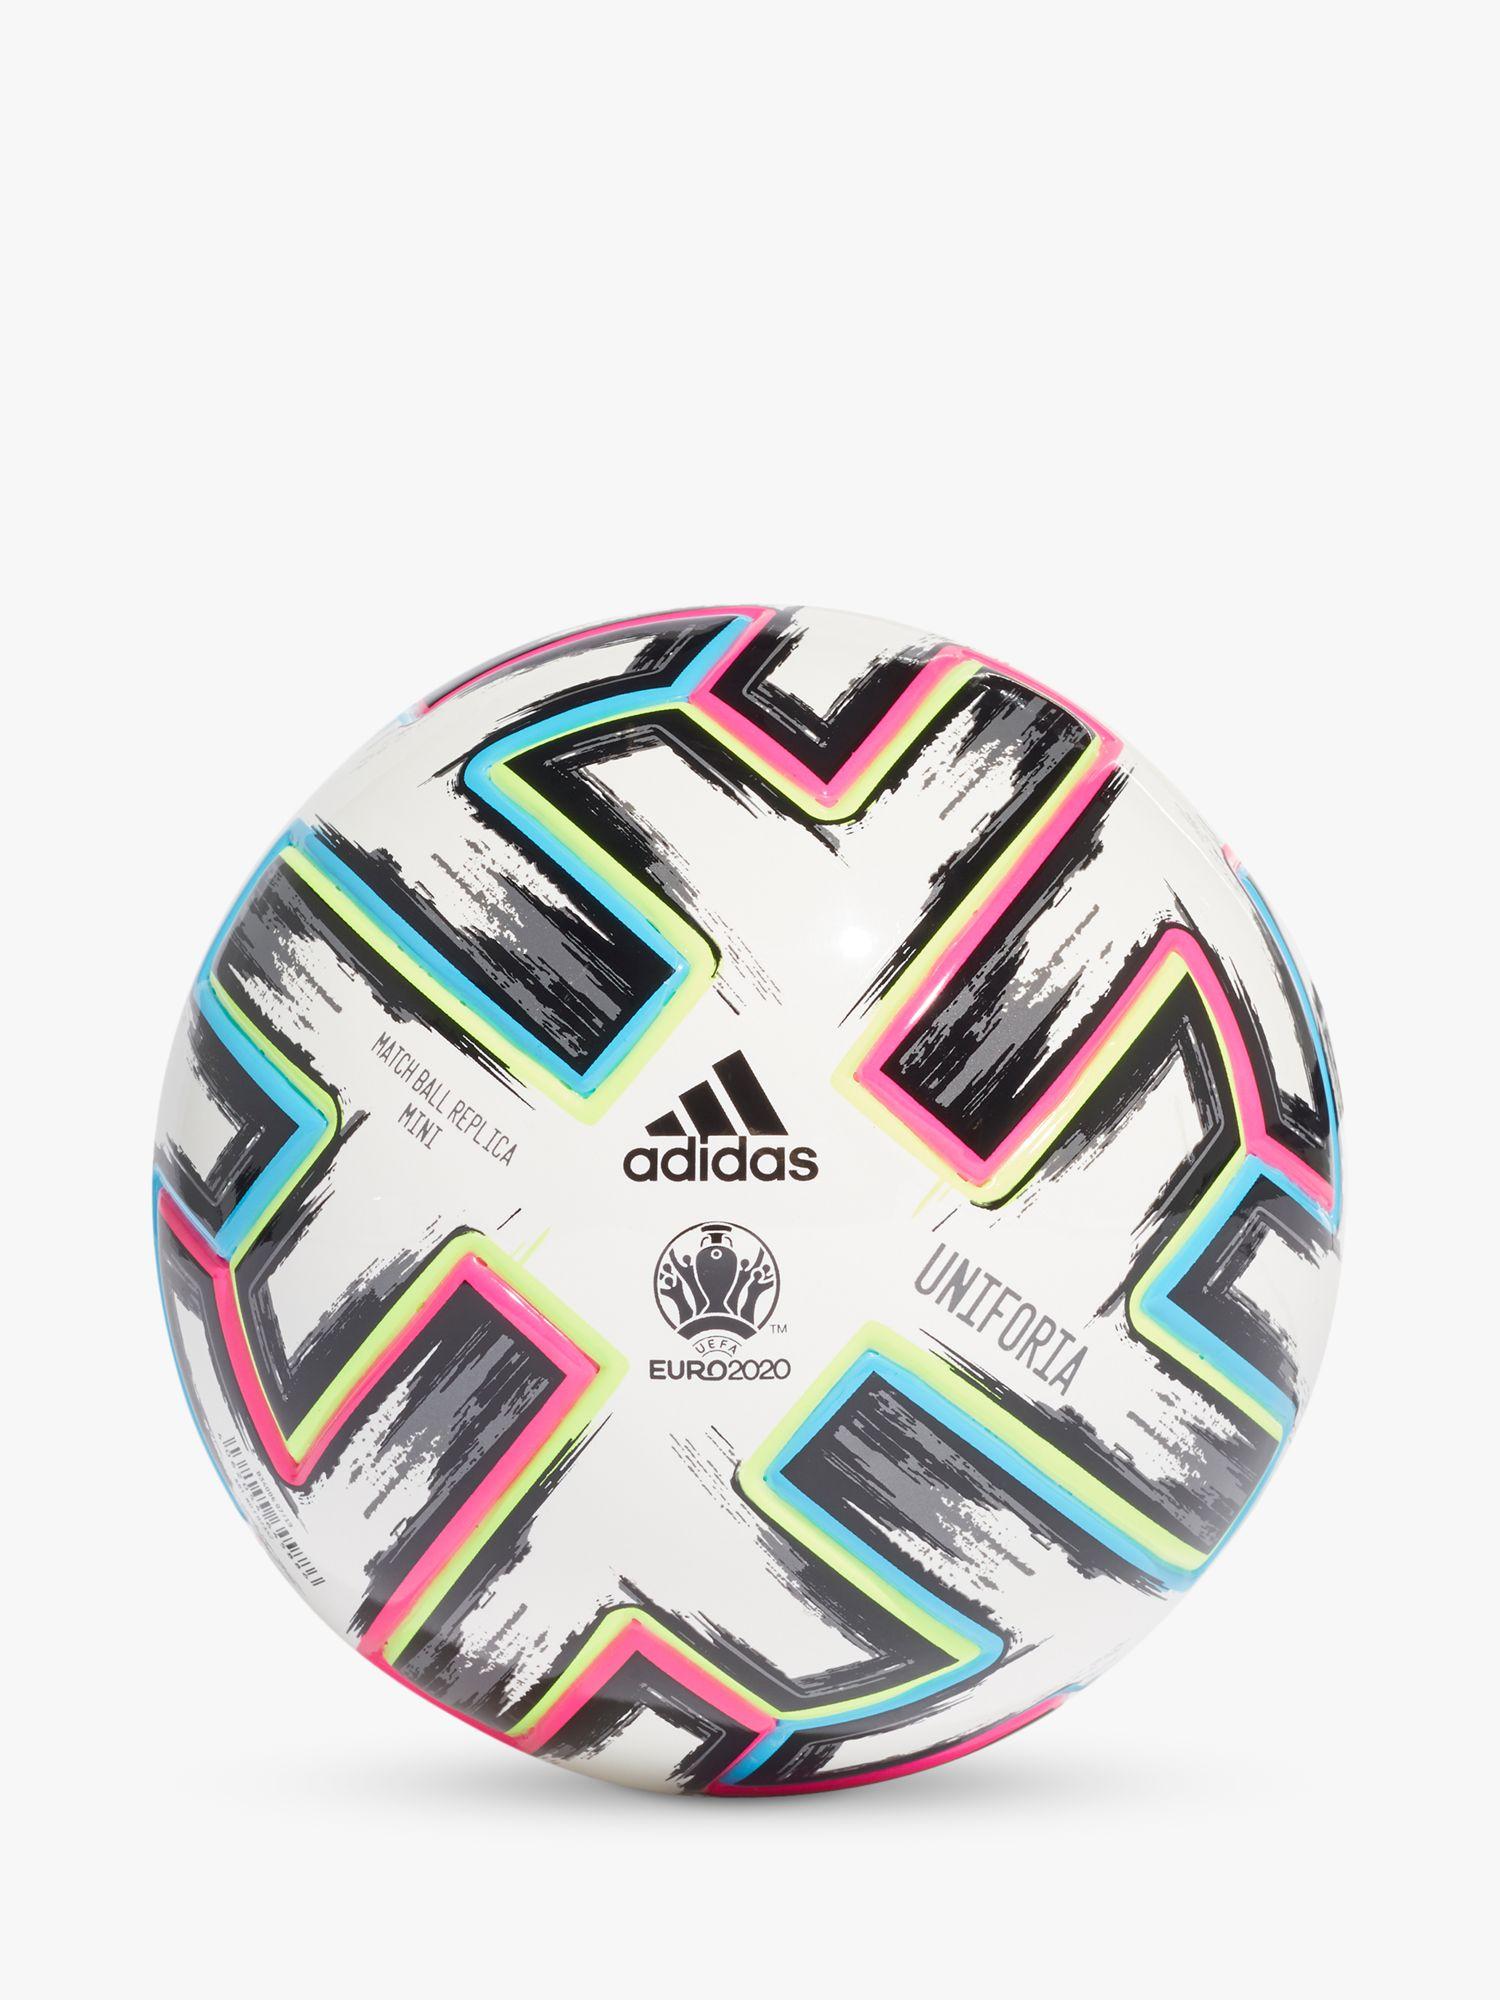 Adidas adidas UEFA EURO 2020 Uniforia Football, Size 1